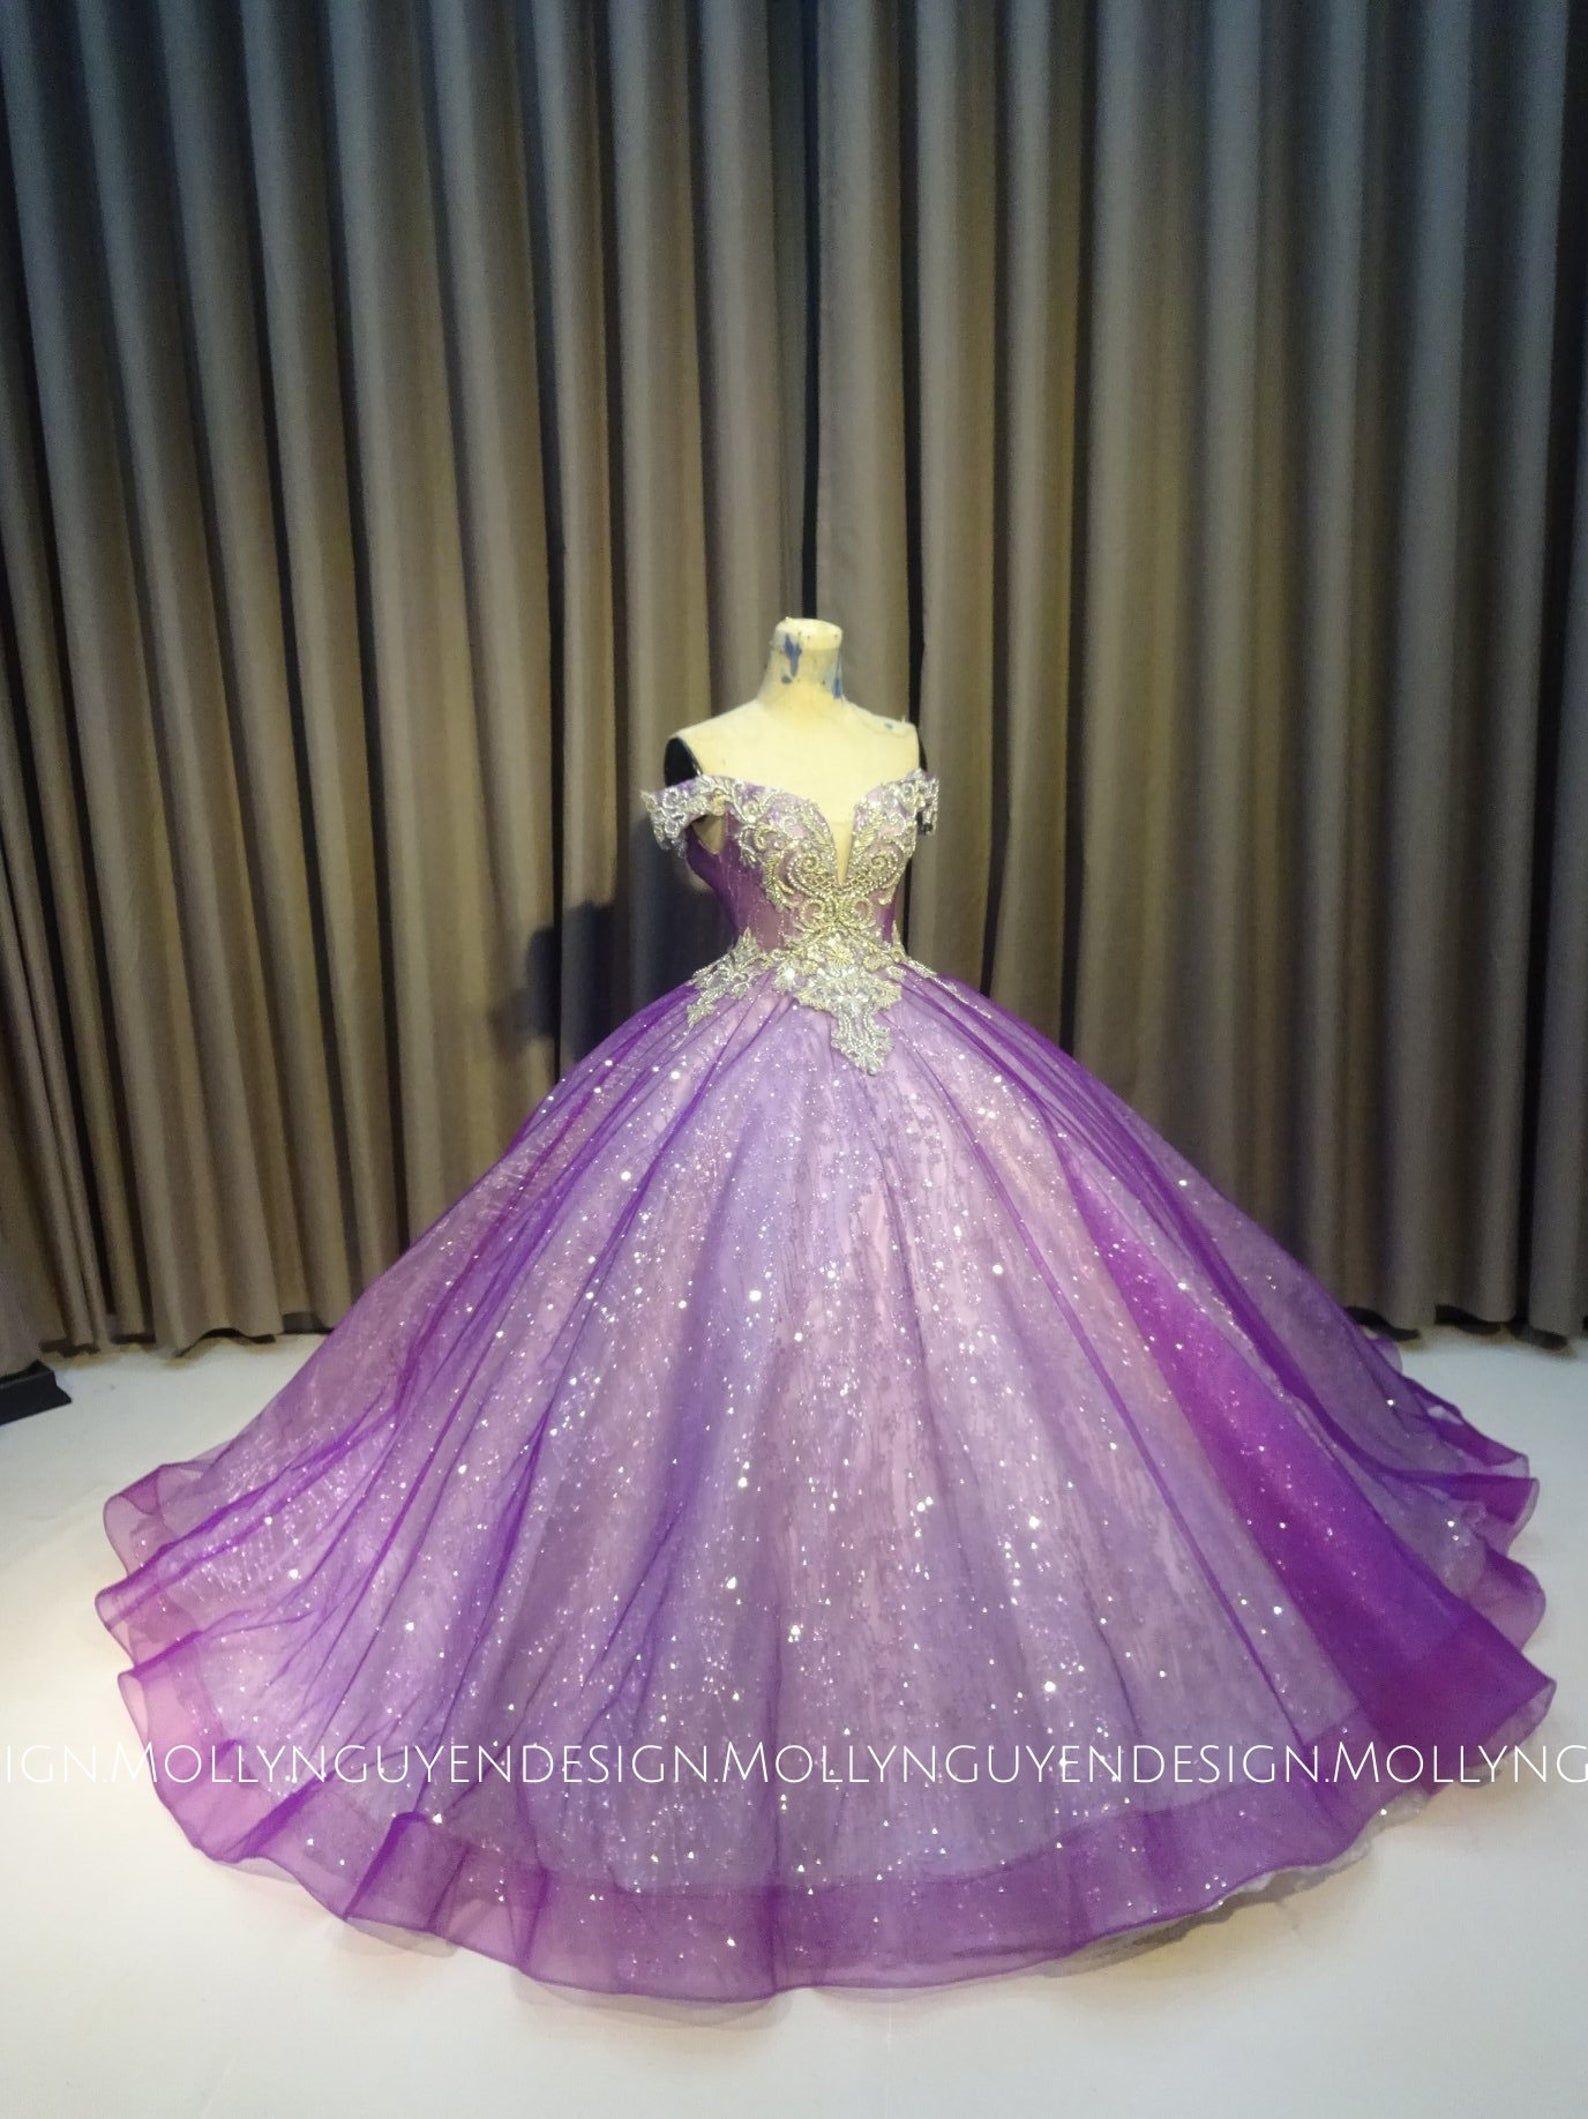 Sparkly Purple Gown Purple Wedding Gown Modern Evening Wear Lace Ballgown Custom Made Purple Wedding Gown Purple Gowns Purple Quinceanera Dresses [ 2119 x 1588 Pixel ]